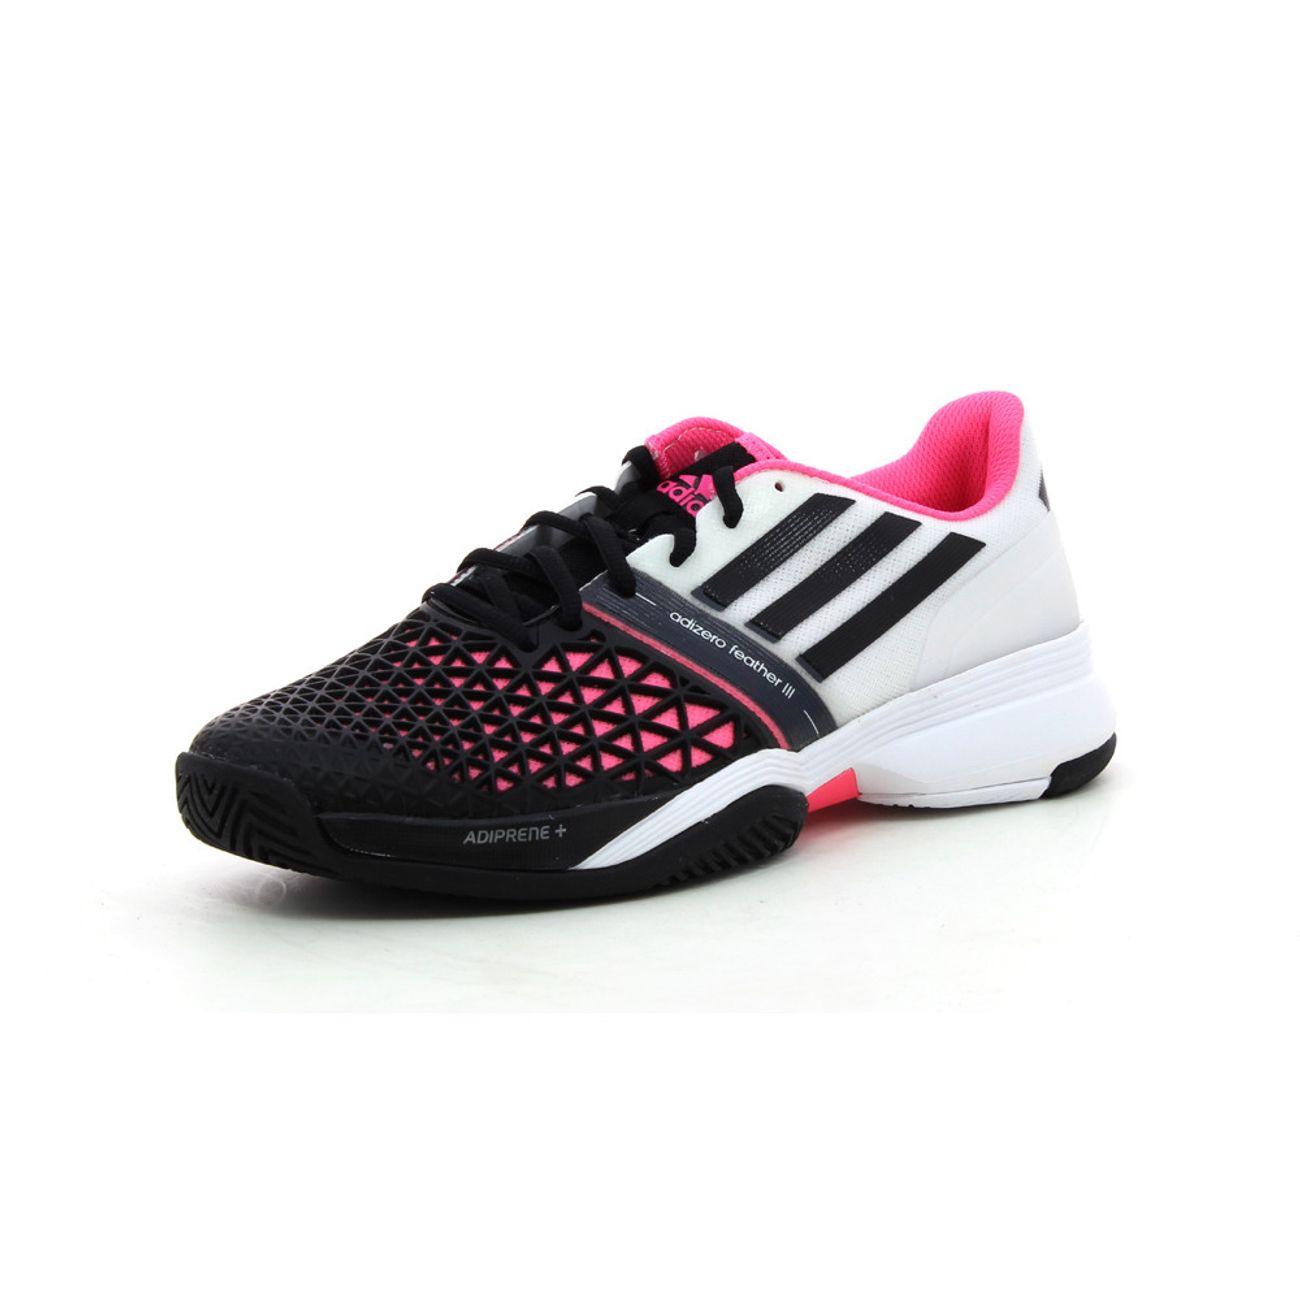 chaussures tennis adidas